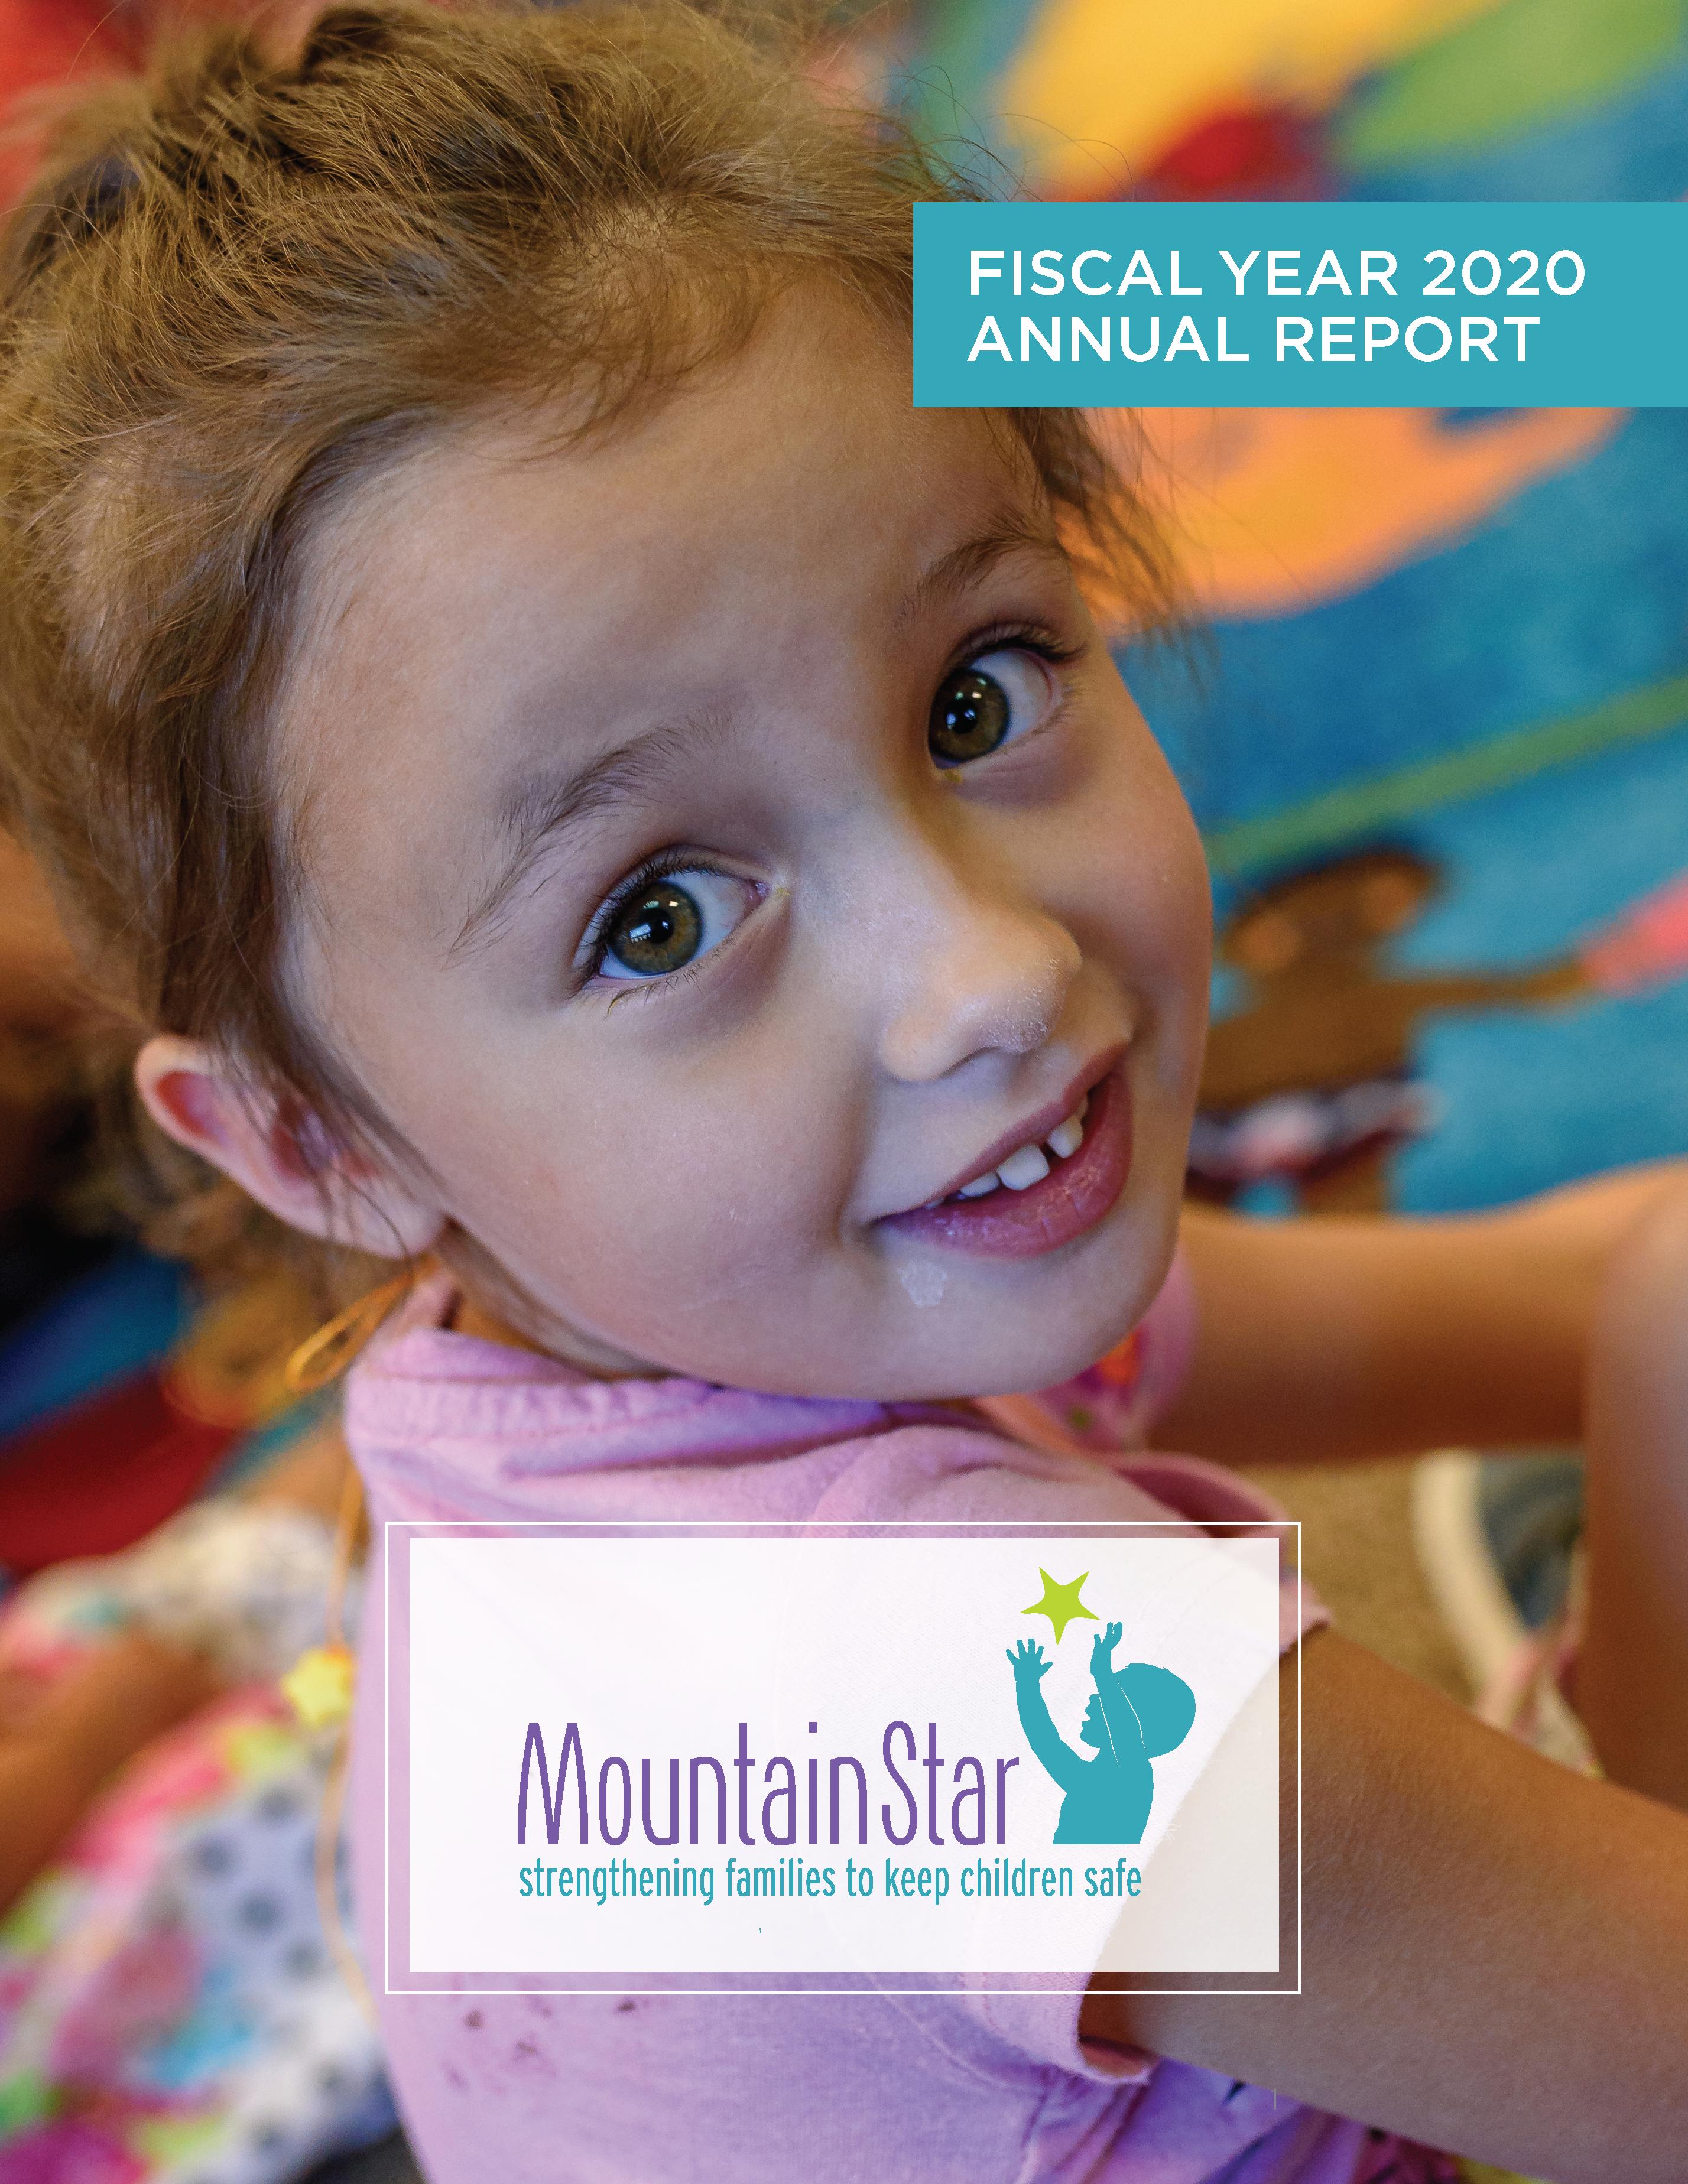 Annual Report (2019-2020)